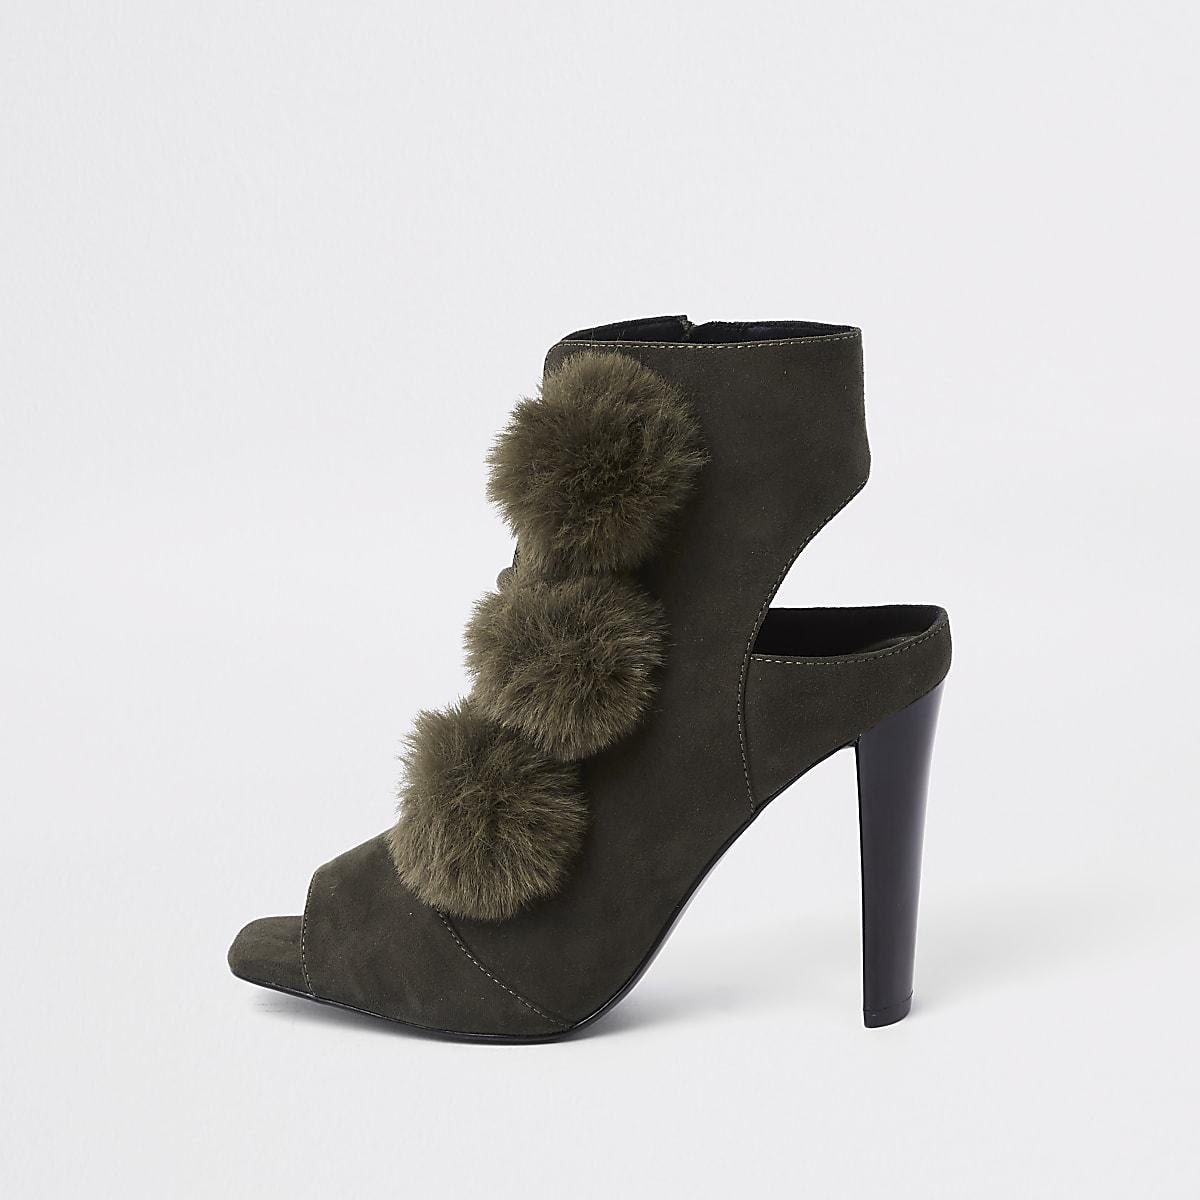 Khaki faux fur pom pom open toe shoe boot